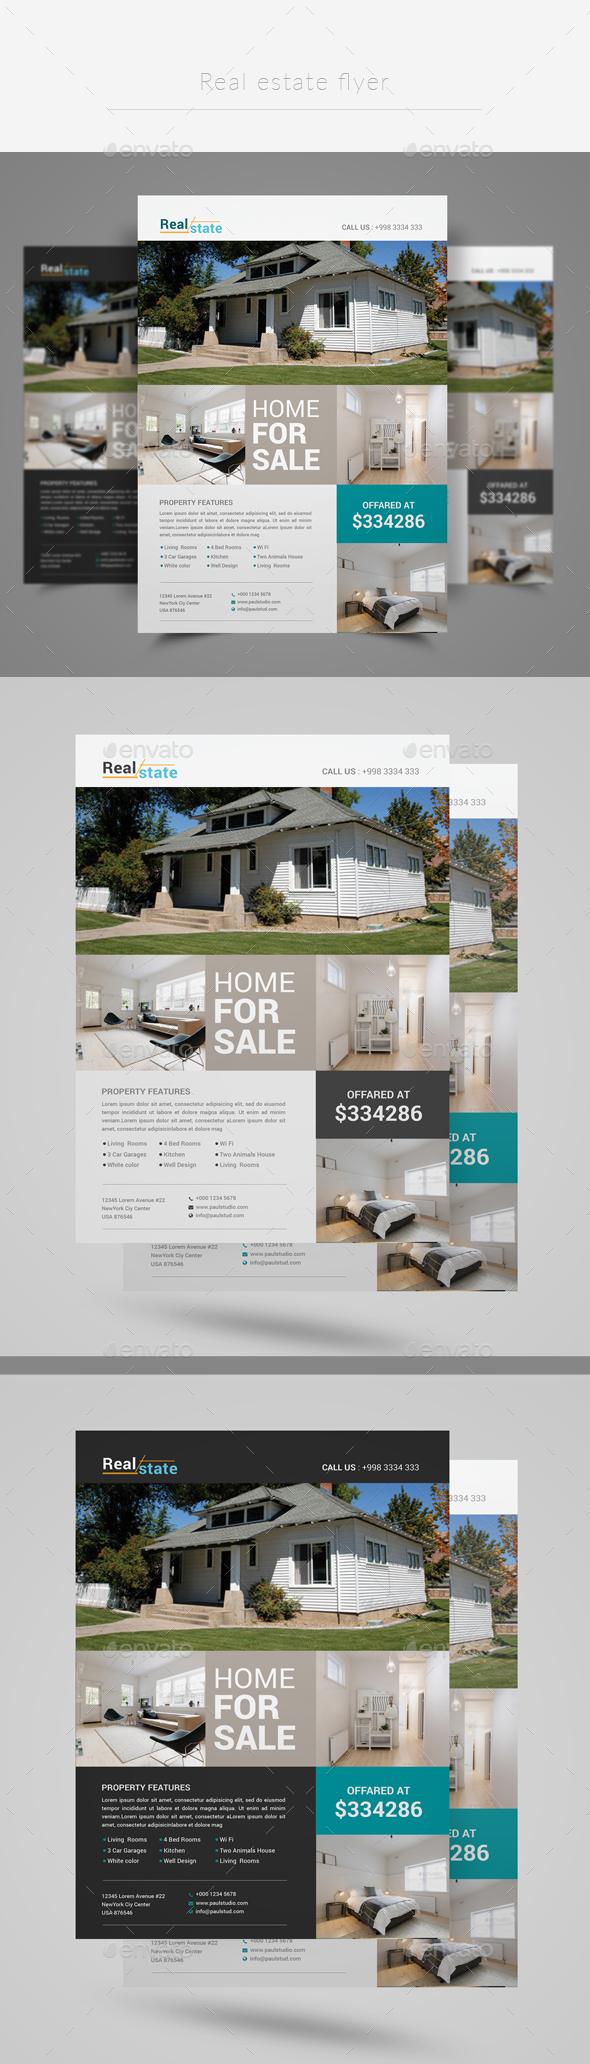 Graphicriver Real estate flyer 19285190